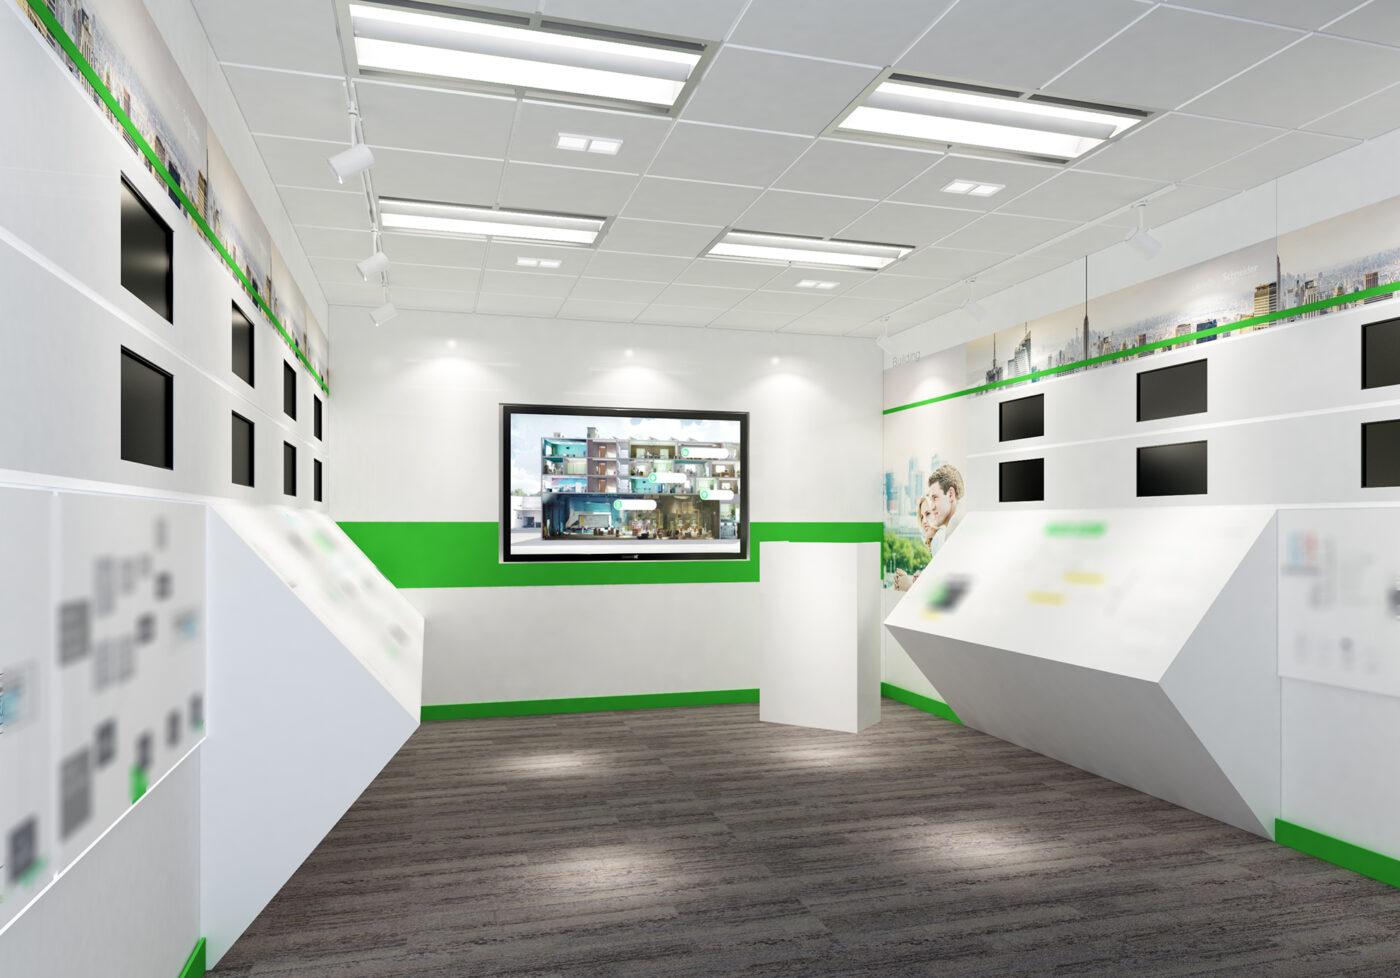 schneider mcx interior. Black Bedroom Furniture Sets. Home Design Ideas